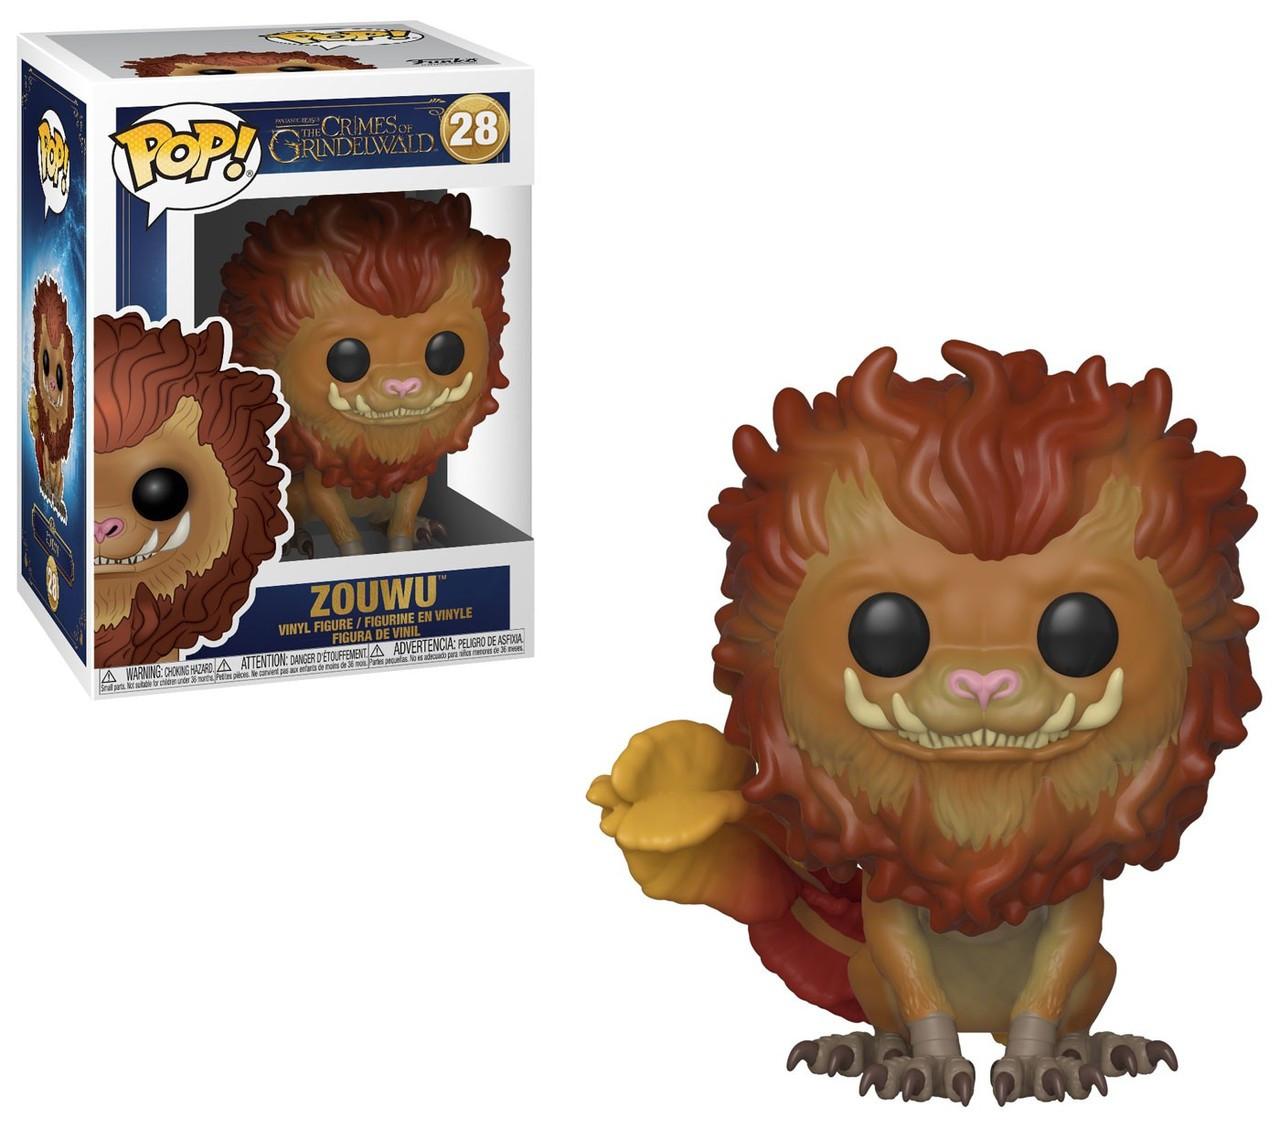 26256efe75b Funko Harry Potter Fantastic Beasts The Crimes of Grindelwald Funko POP  Movies Zouwu Vinyl Figure 28 - ToyWiz